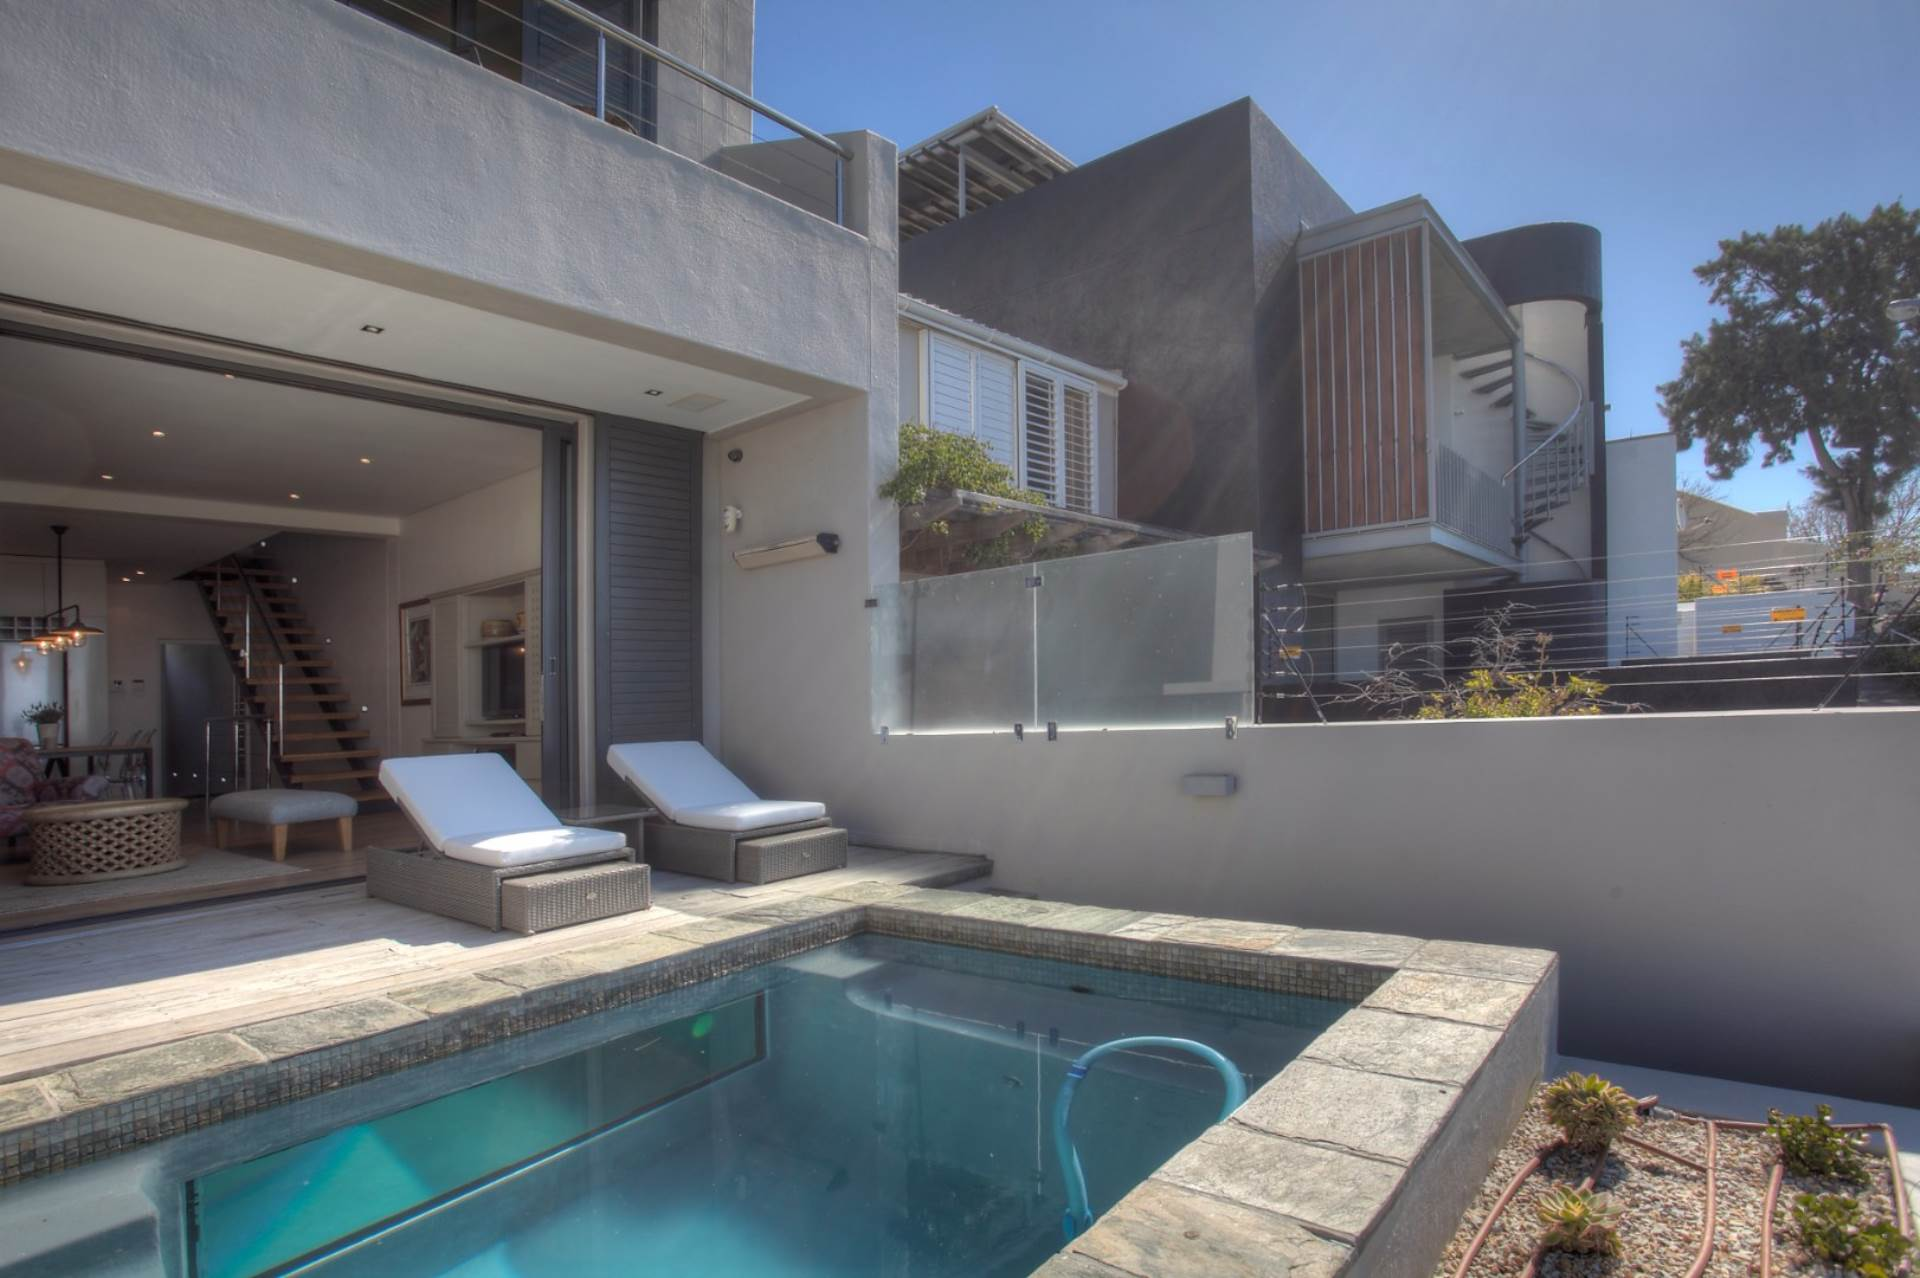 De Waterkant property for sale. Ref No: 13533994. Picture no 14